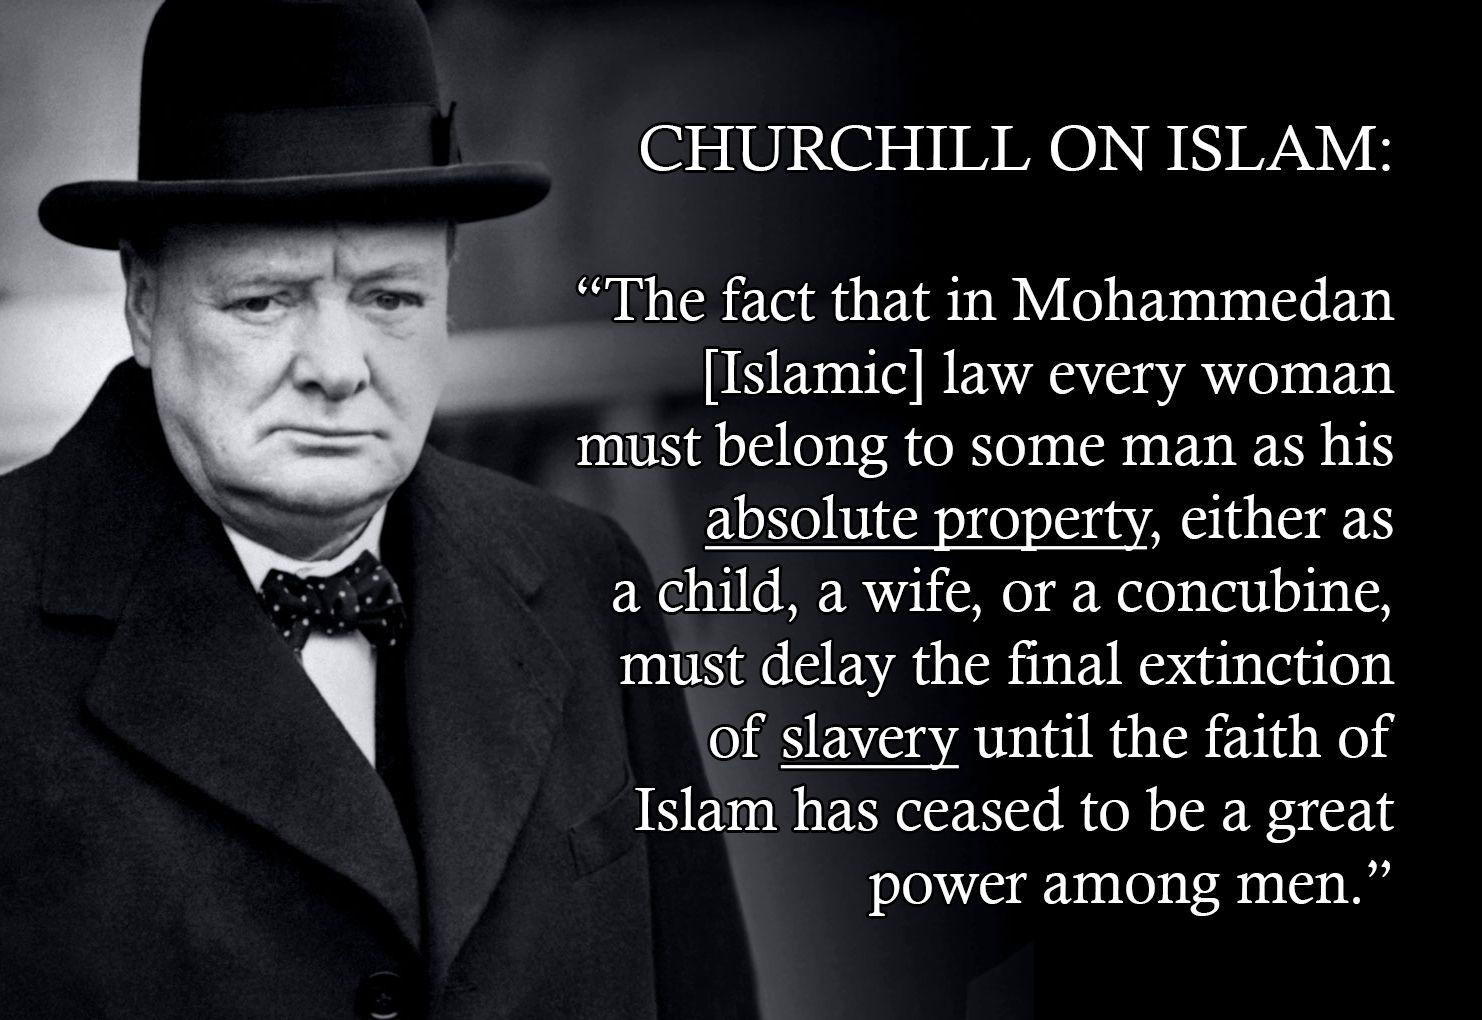 Betty white quotes quotesgram - Winston Churchill On Islam Quotes Quotesgram